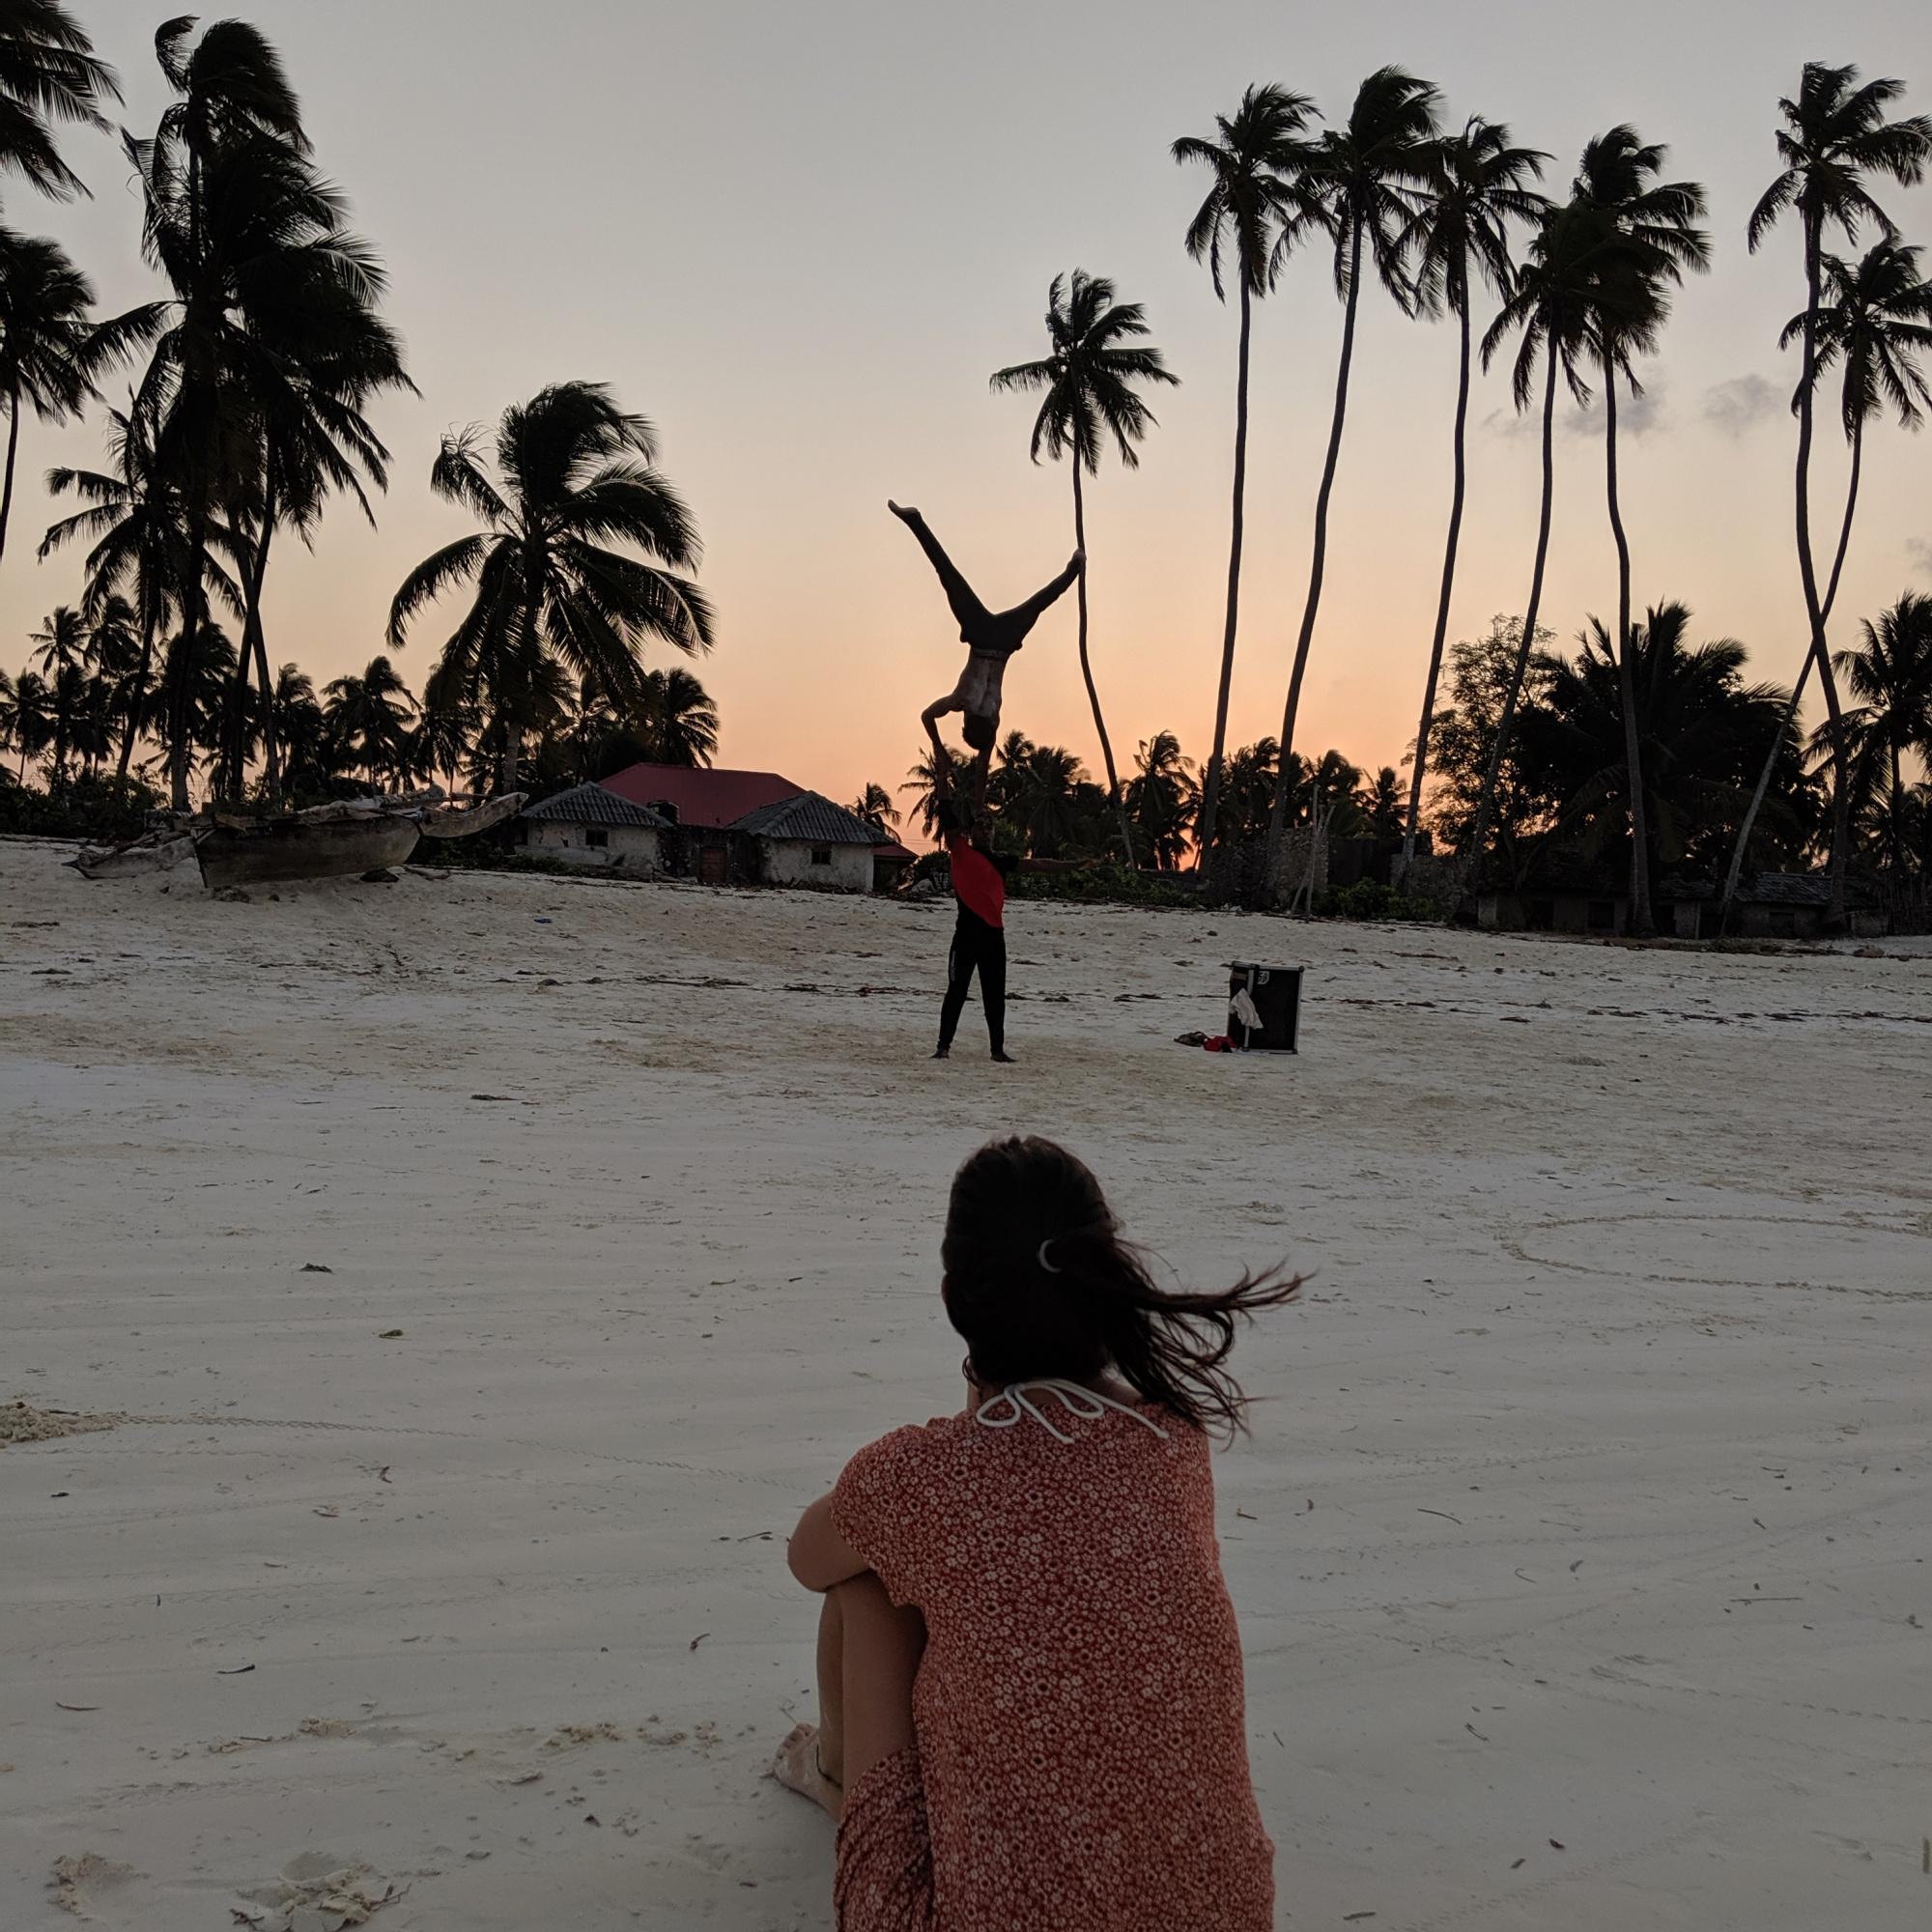 Watching people training an acrobatic routine at sunset on Jambiani Beach, Zanzibar